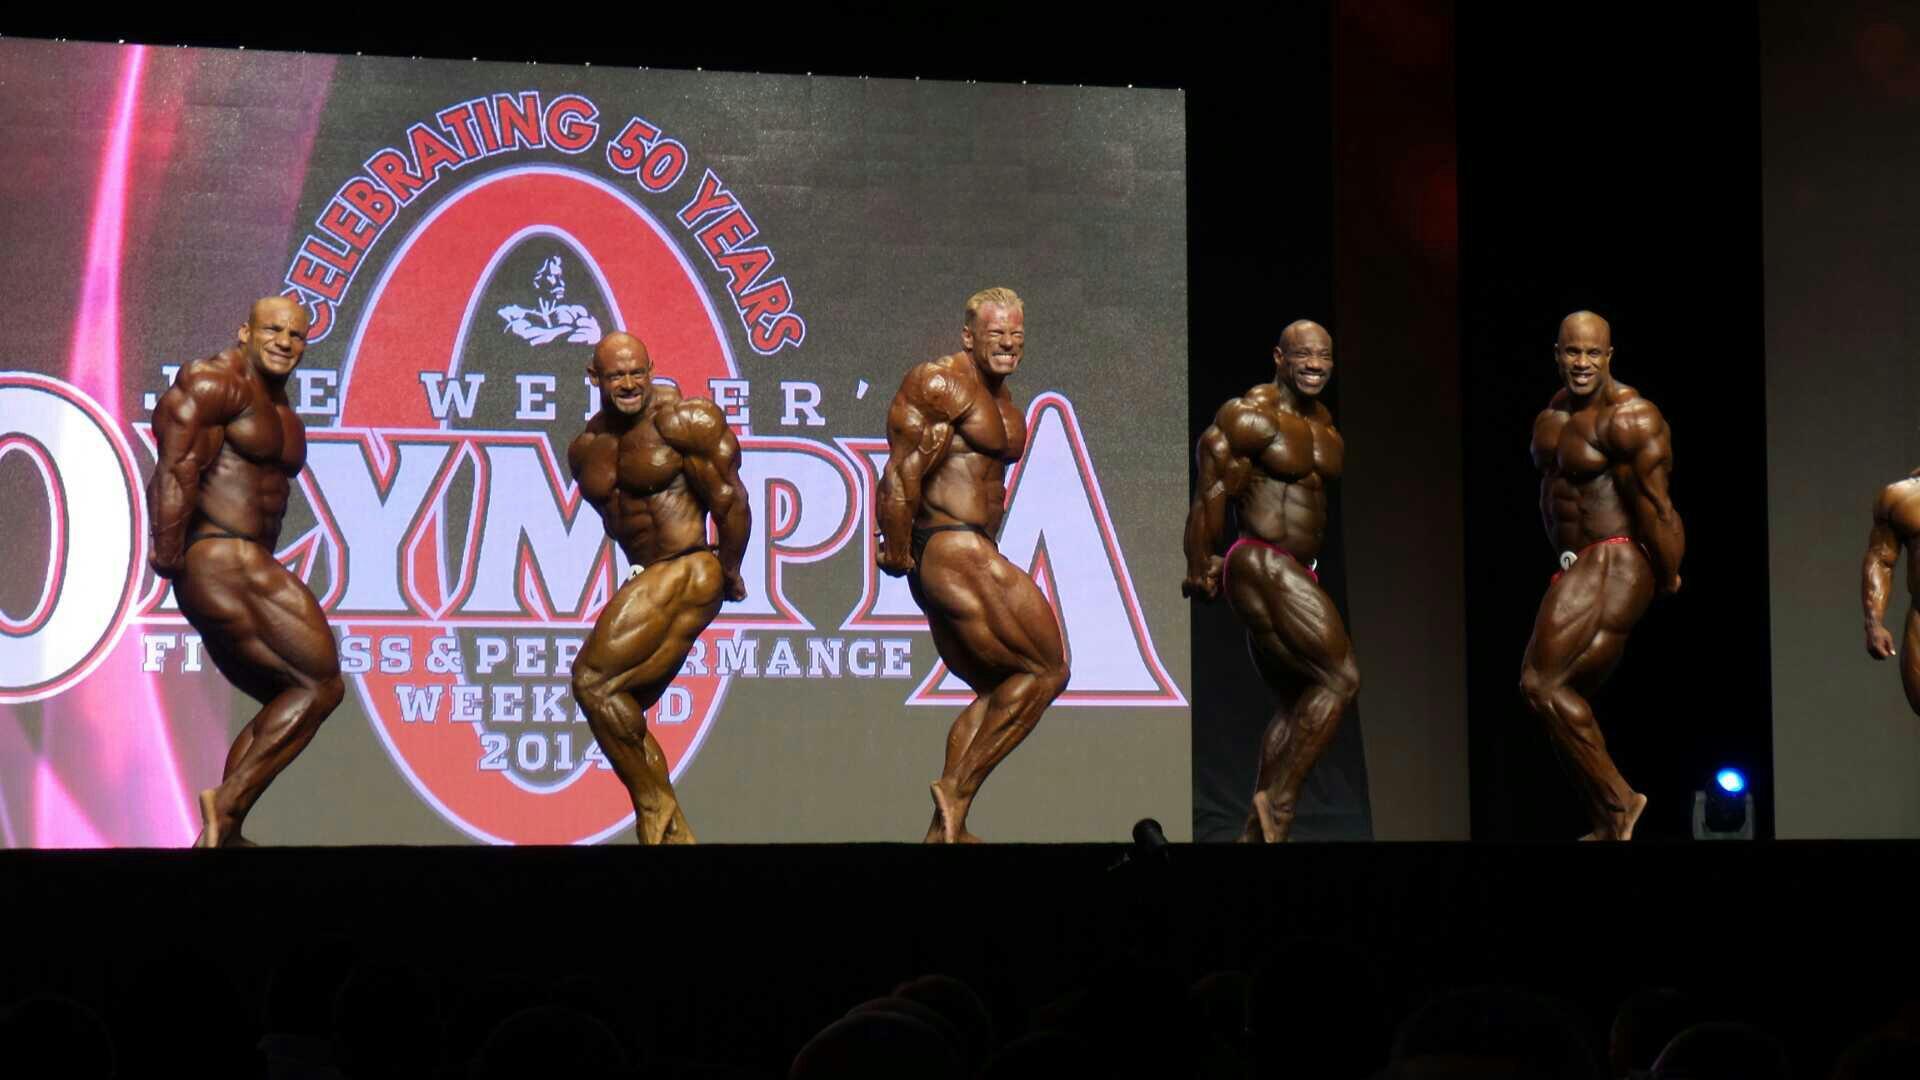 Mr. Olympia 2014 Webcast 8edu5yra